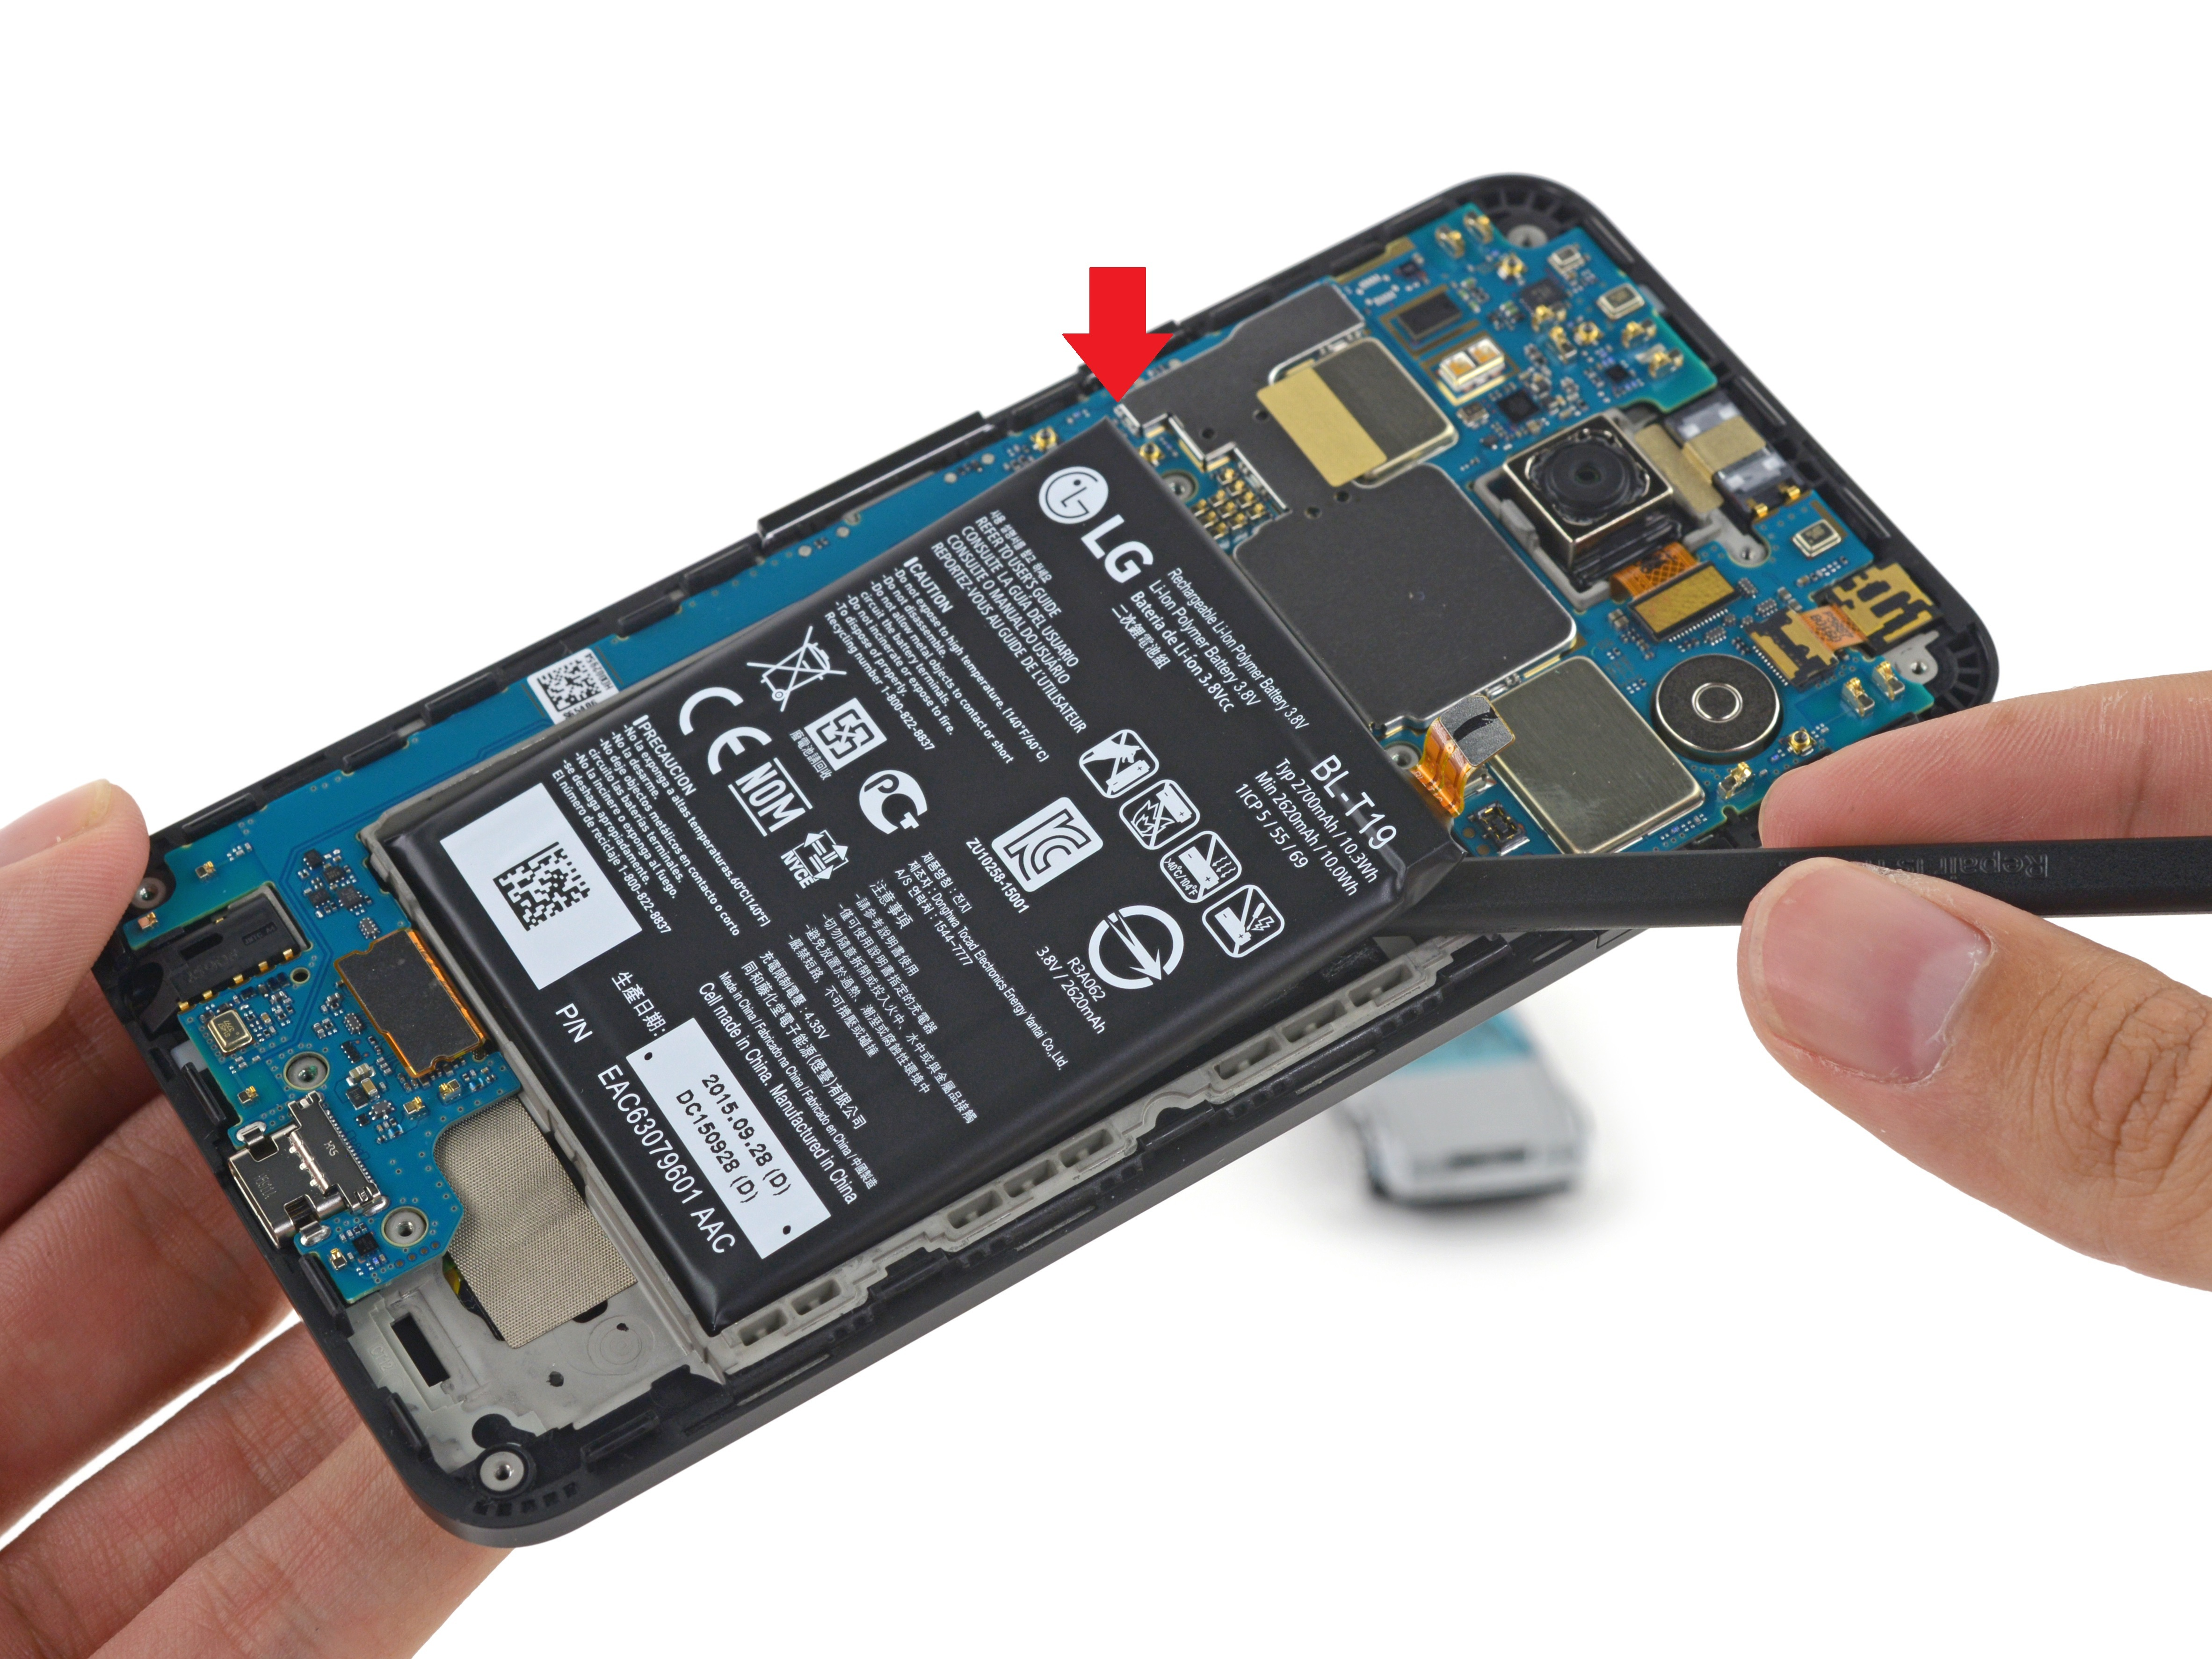 Iphone X Ifixit Wallpaper How To Repair Water Damaged Nexus 5x Ifixit Repair Guide